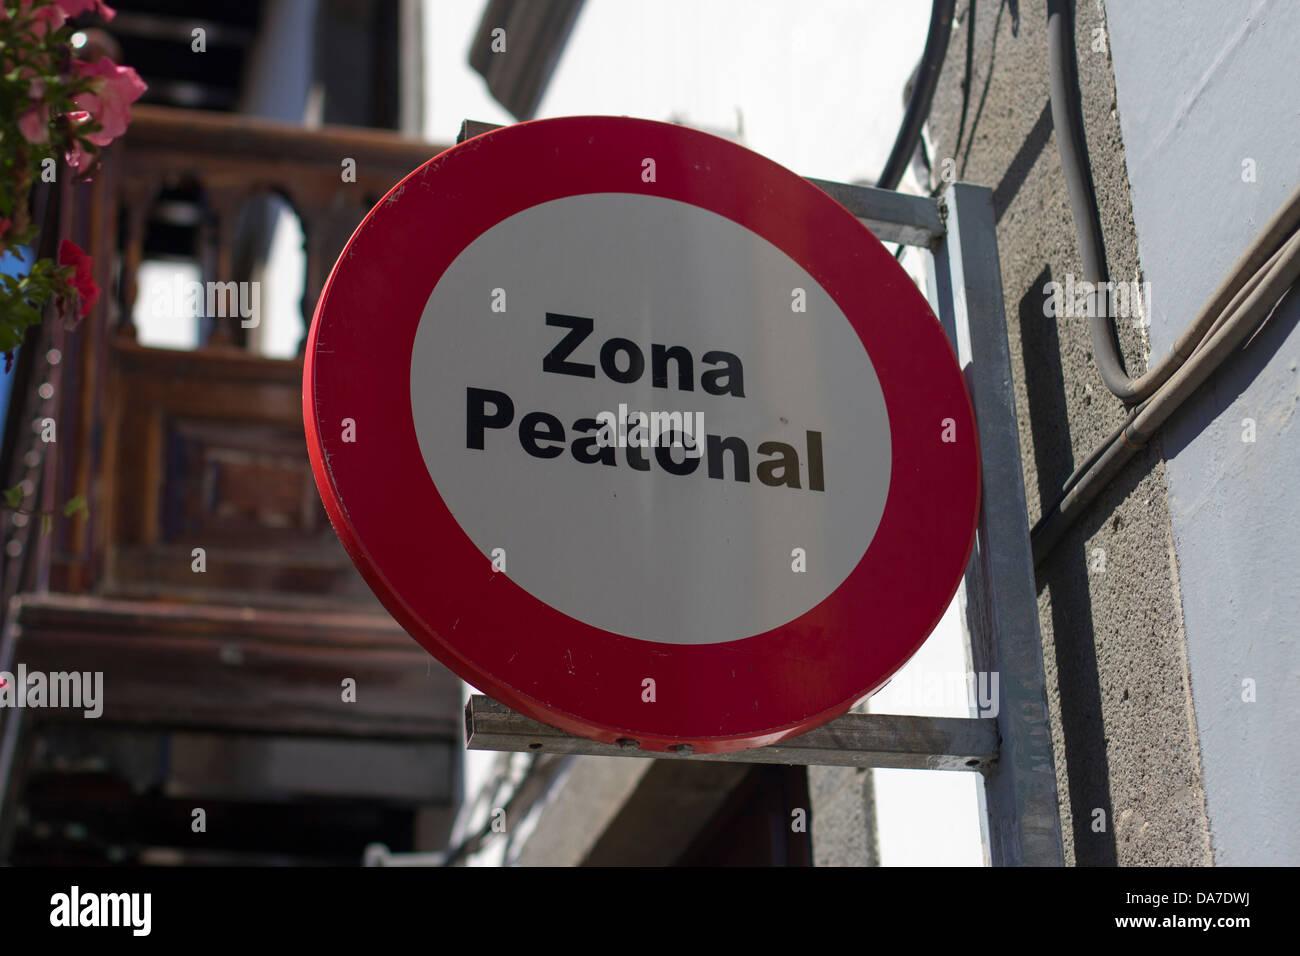 Zona peatonal Stock Photo